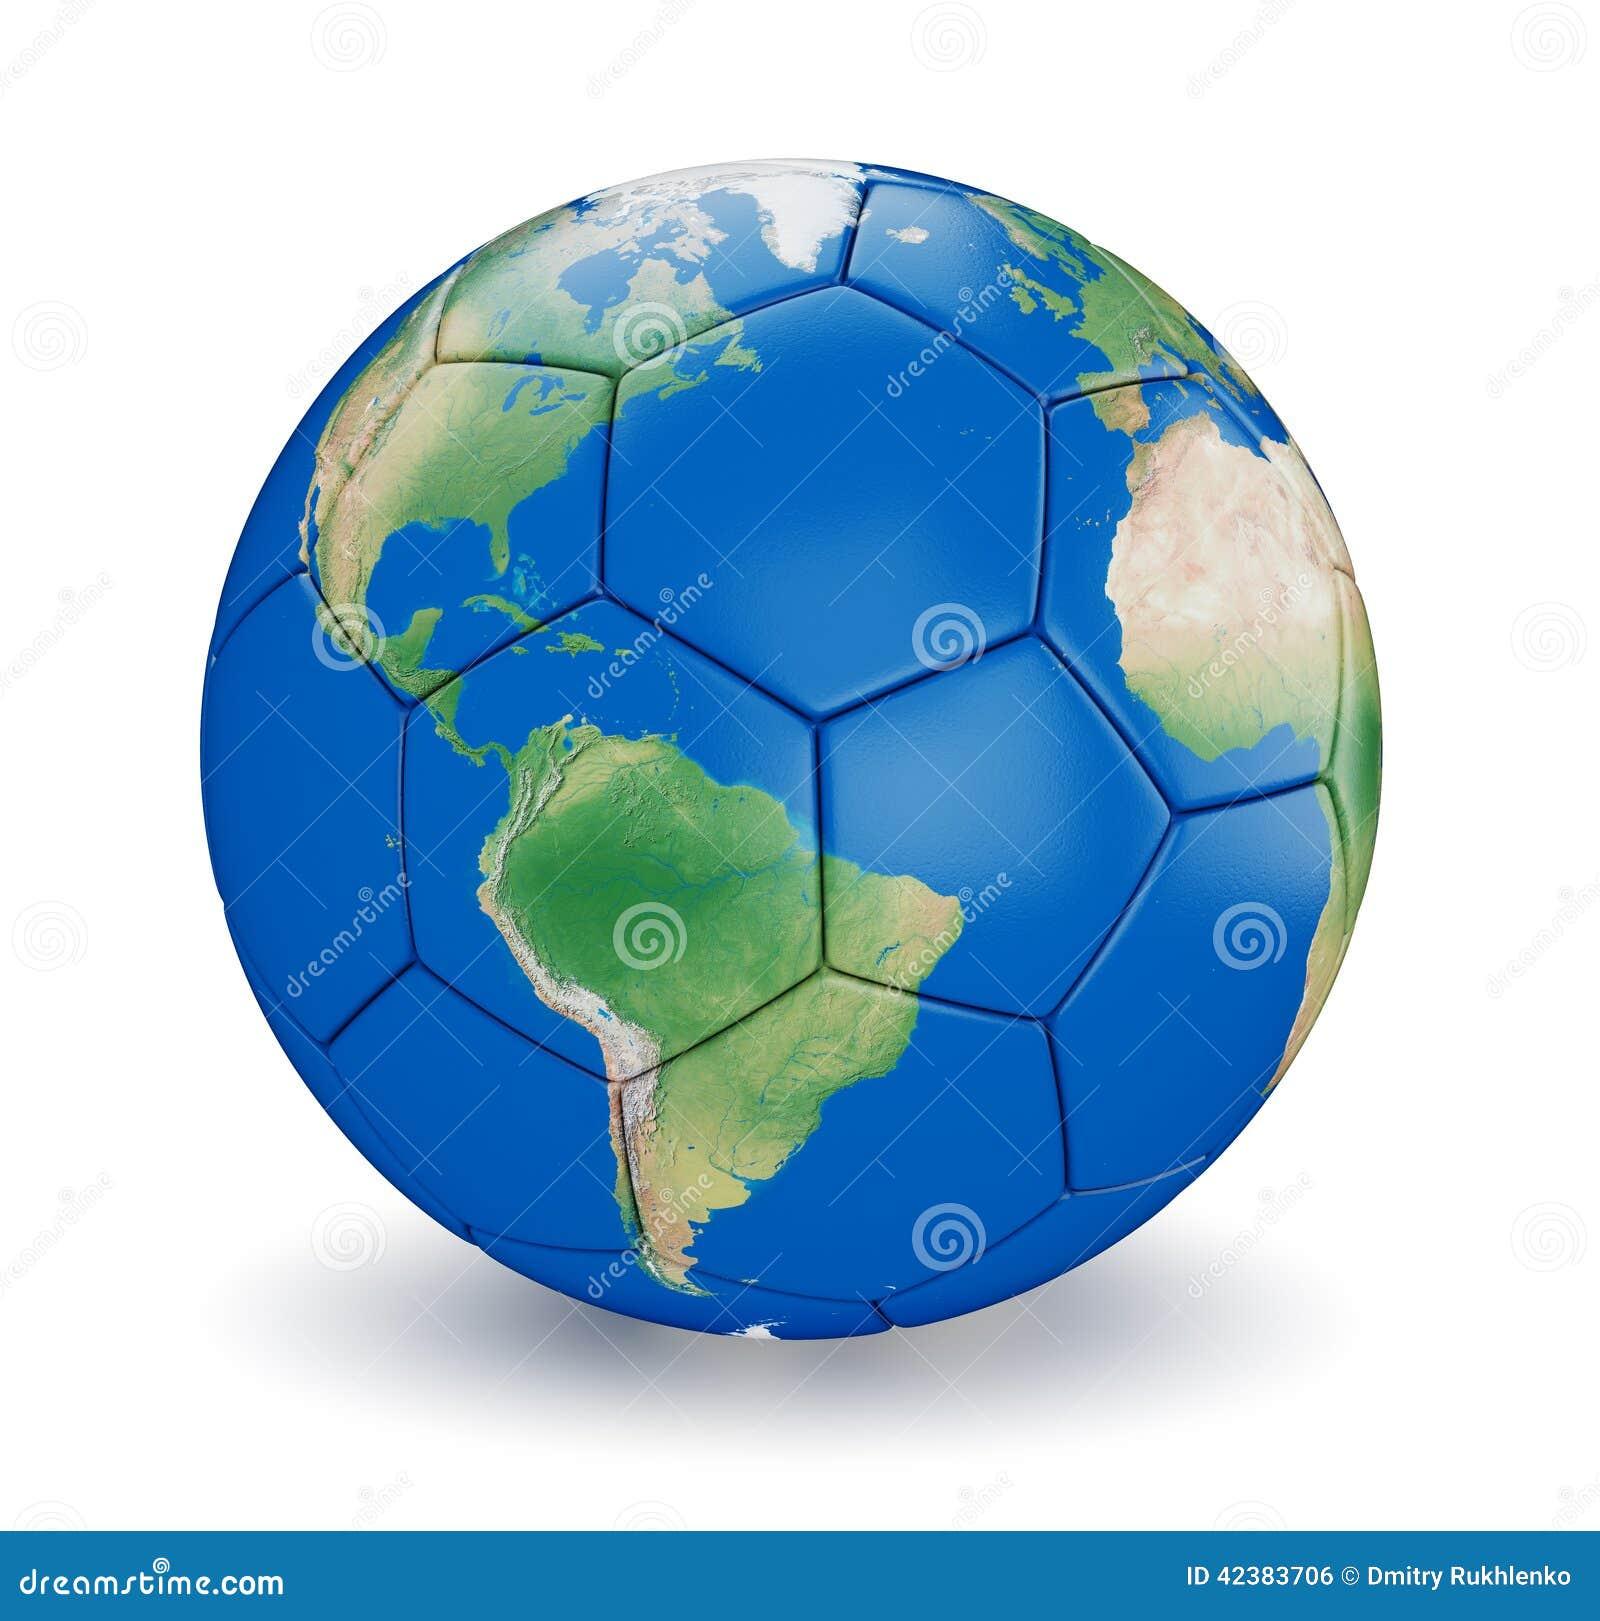 Soccer Ball Shaped Earth Stock Illustration - Image: 42383706